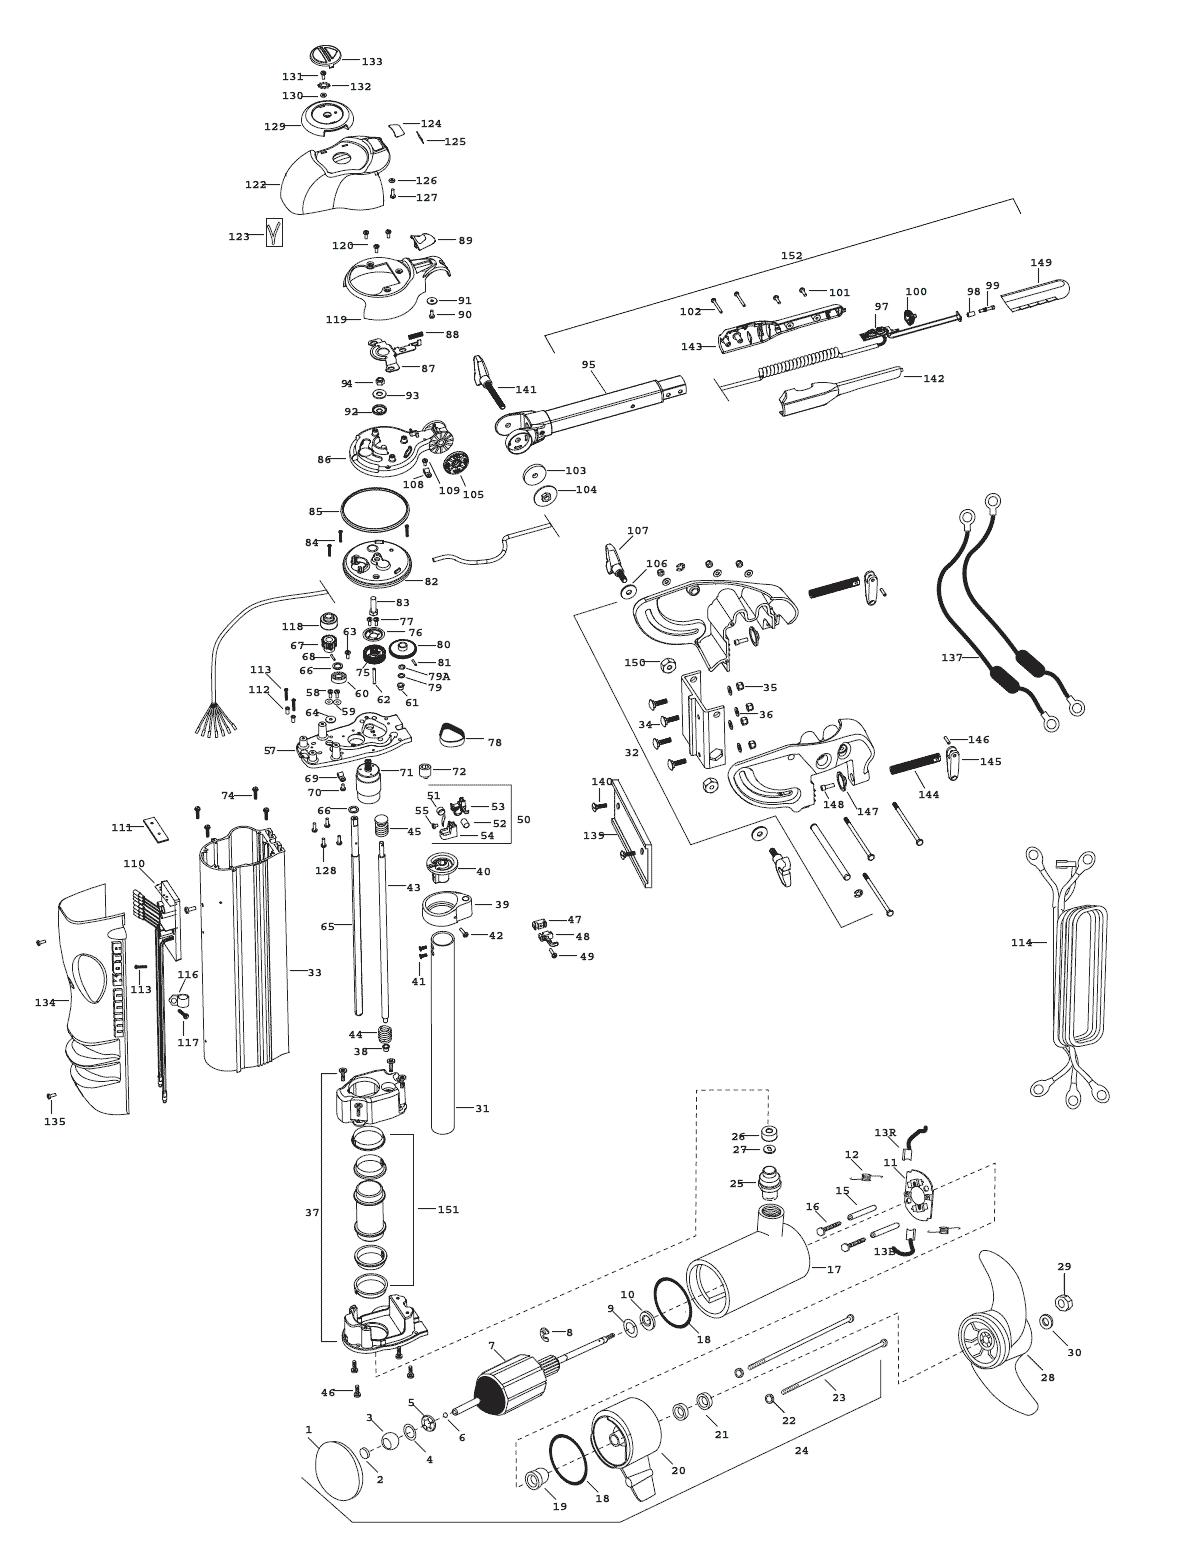 Minn Kota Vantage 101 Parts